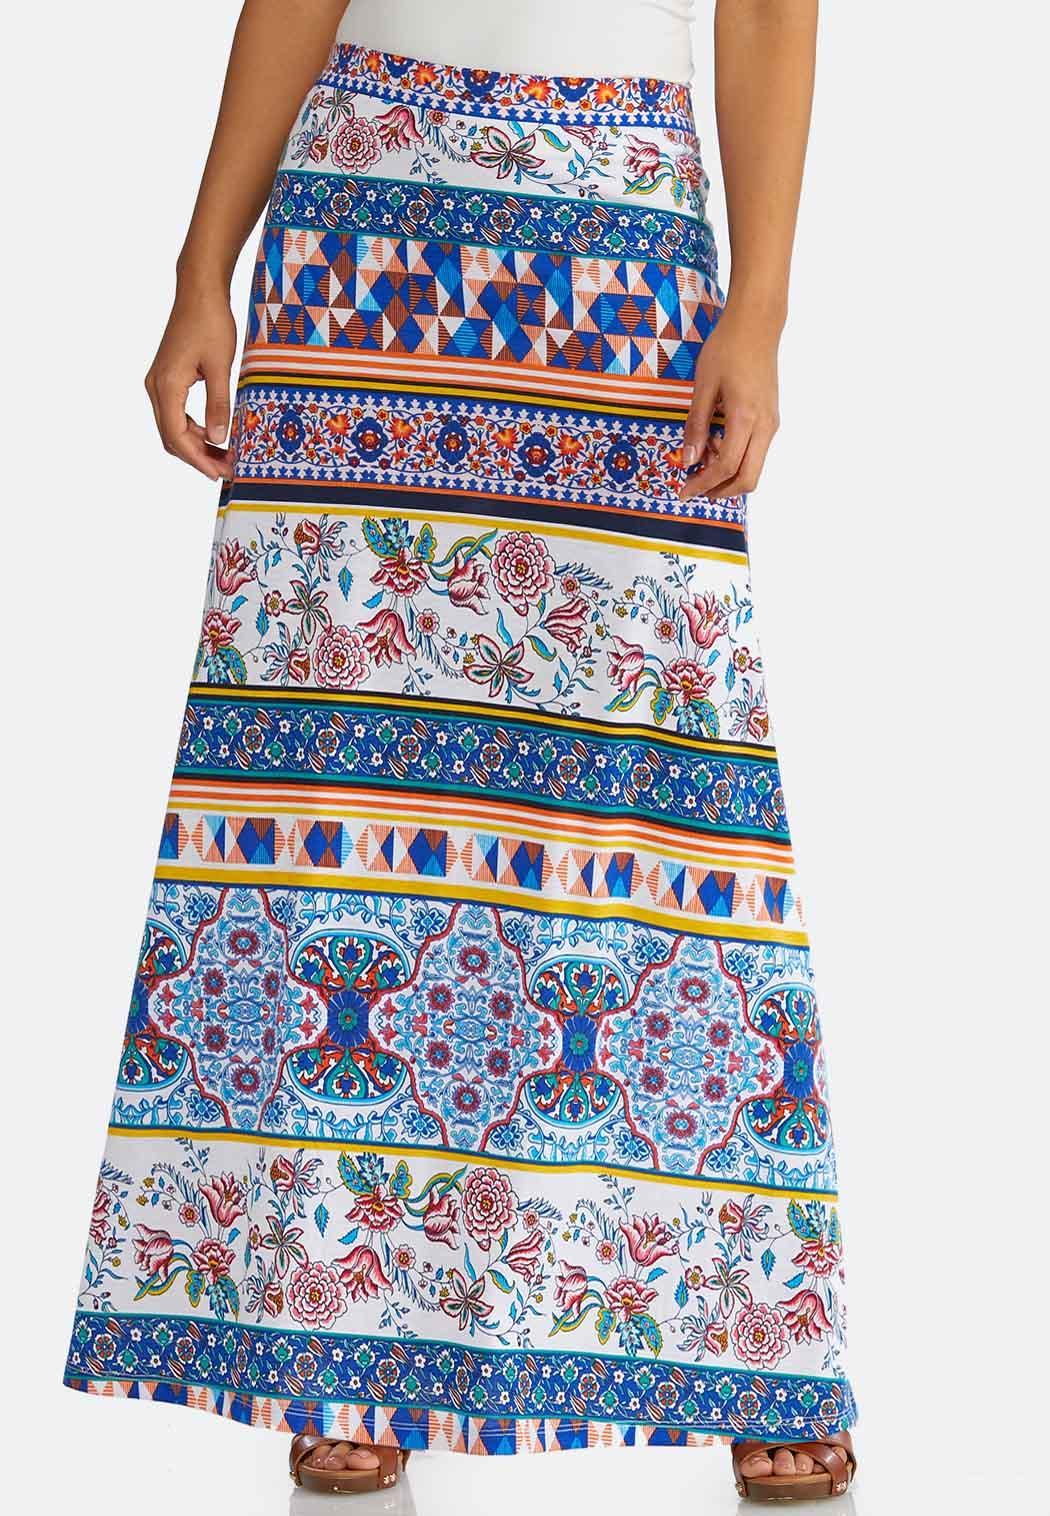 46e4a5e978 Geo Floral Maxi Skirt alternate view · Geo Floral Maxi Skirt